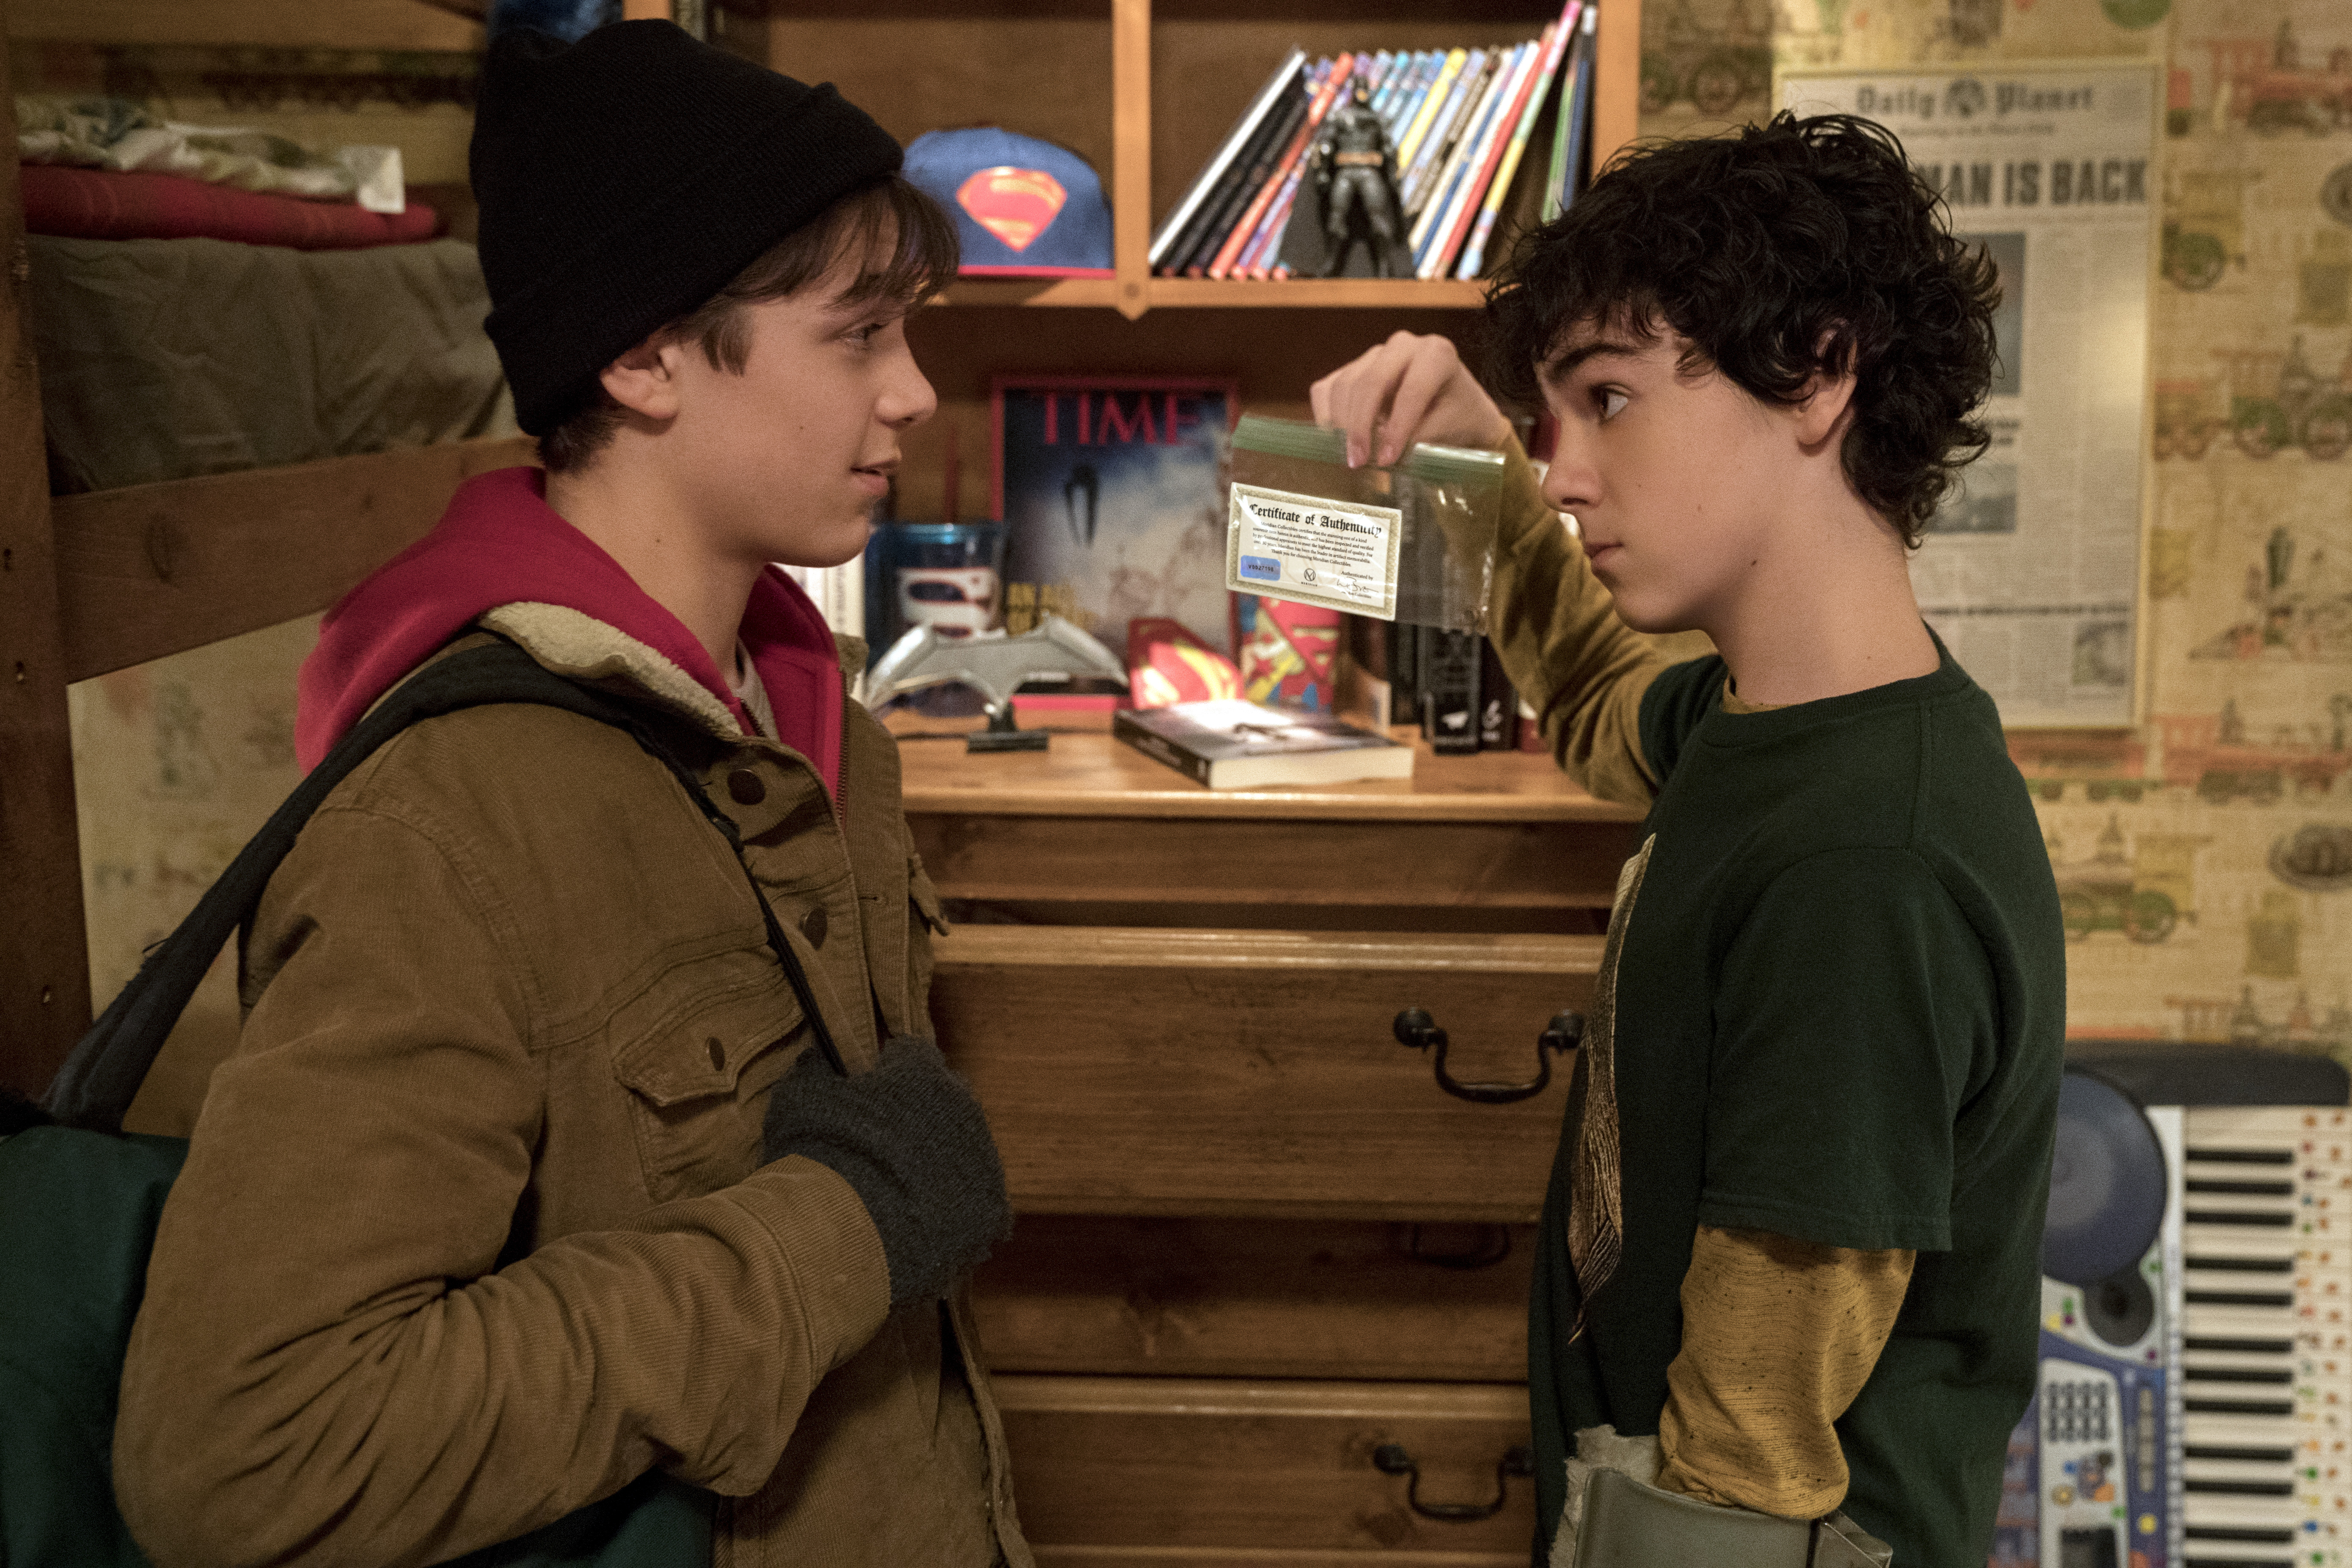 Asher Angel as Billy Batson and Jack Dylan Grazer as Freddy Freeman in Shazam!